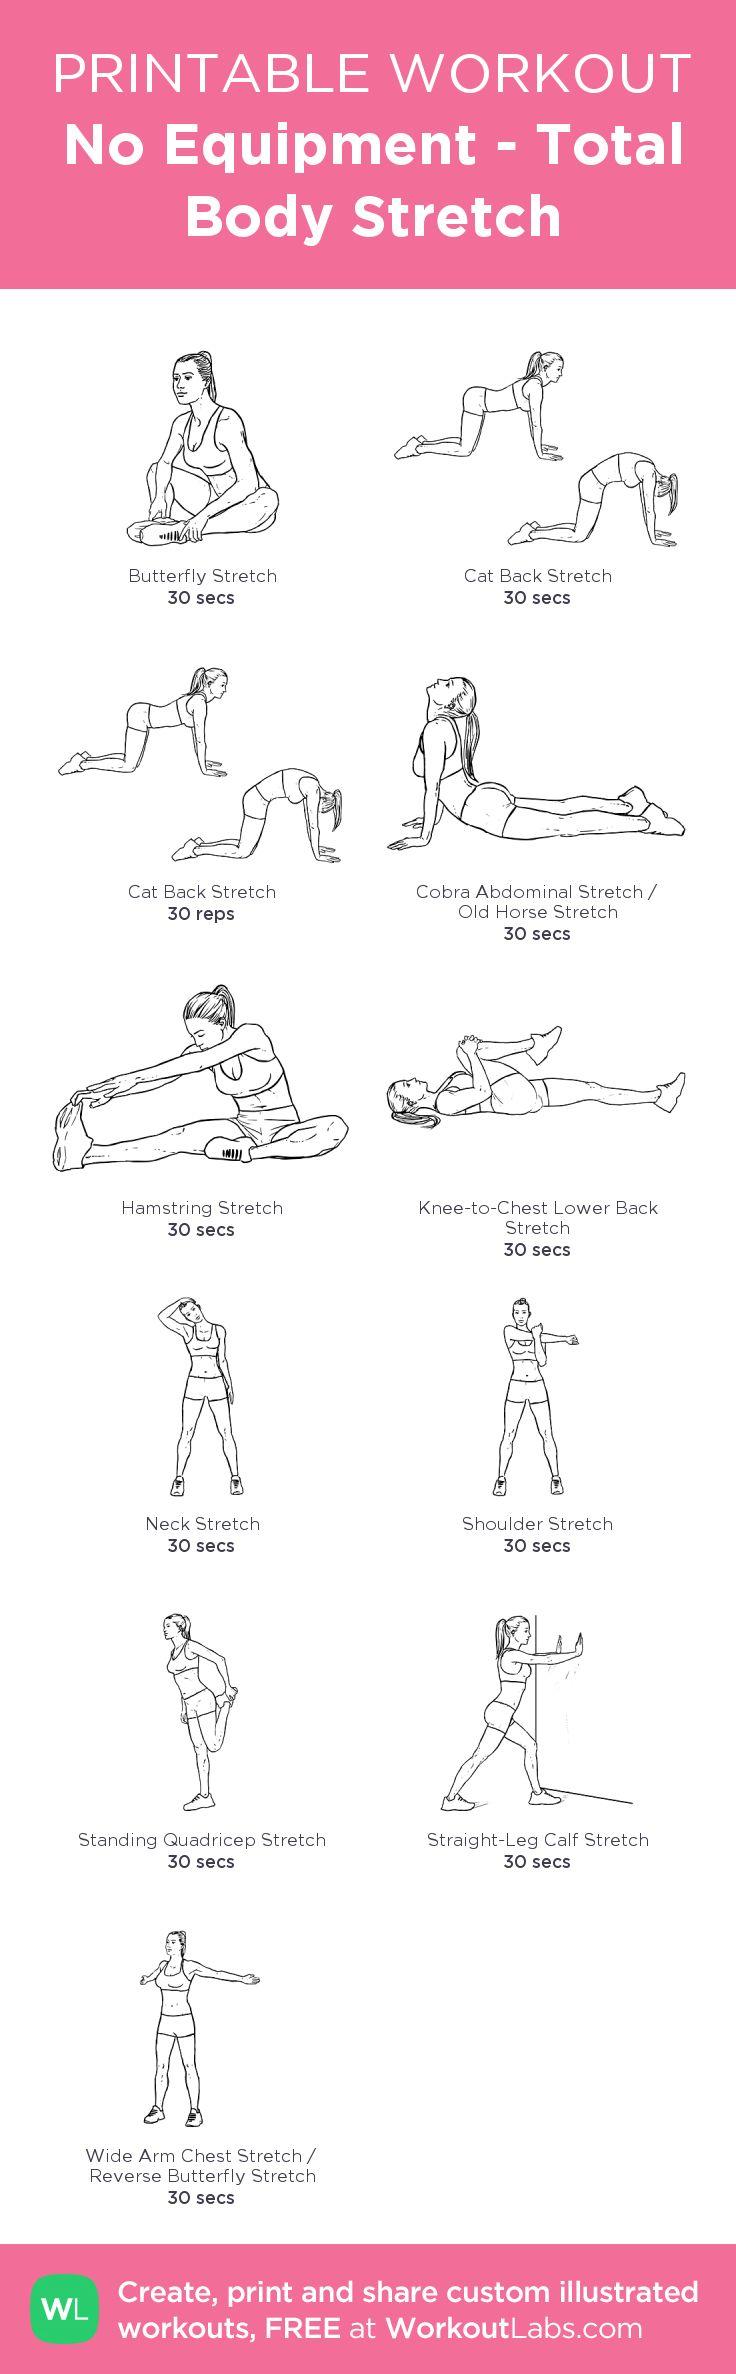 No Equipment - Total Body Stretch